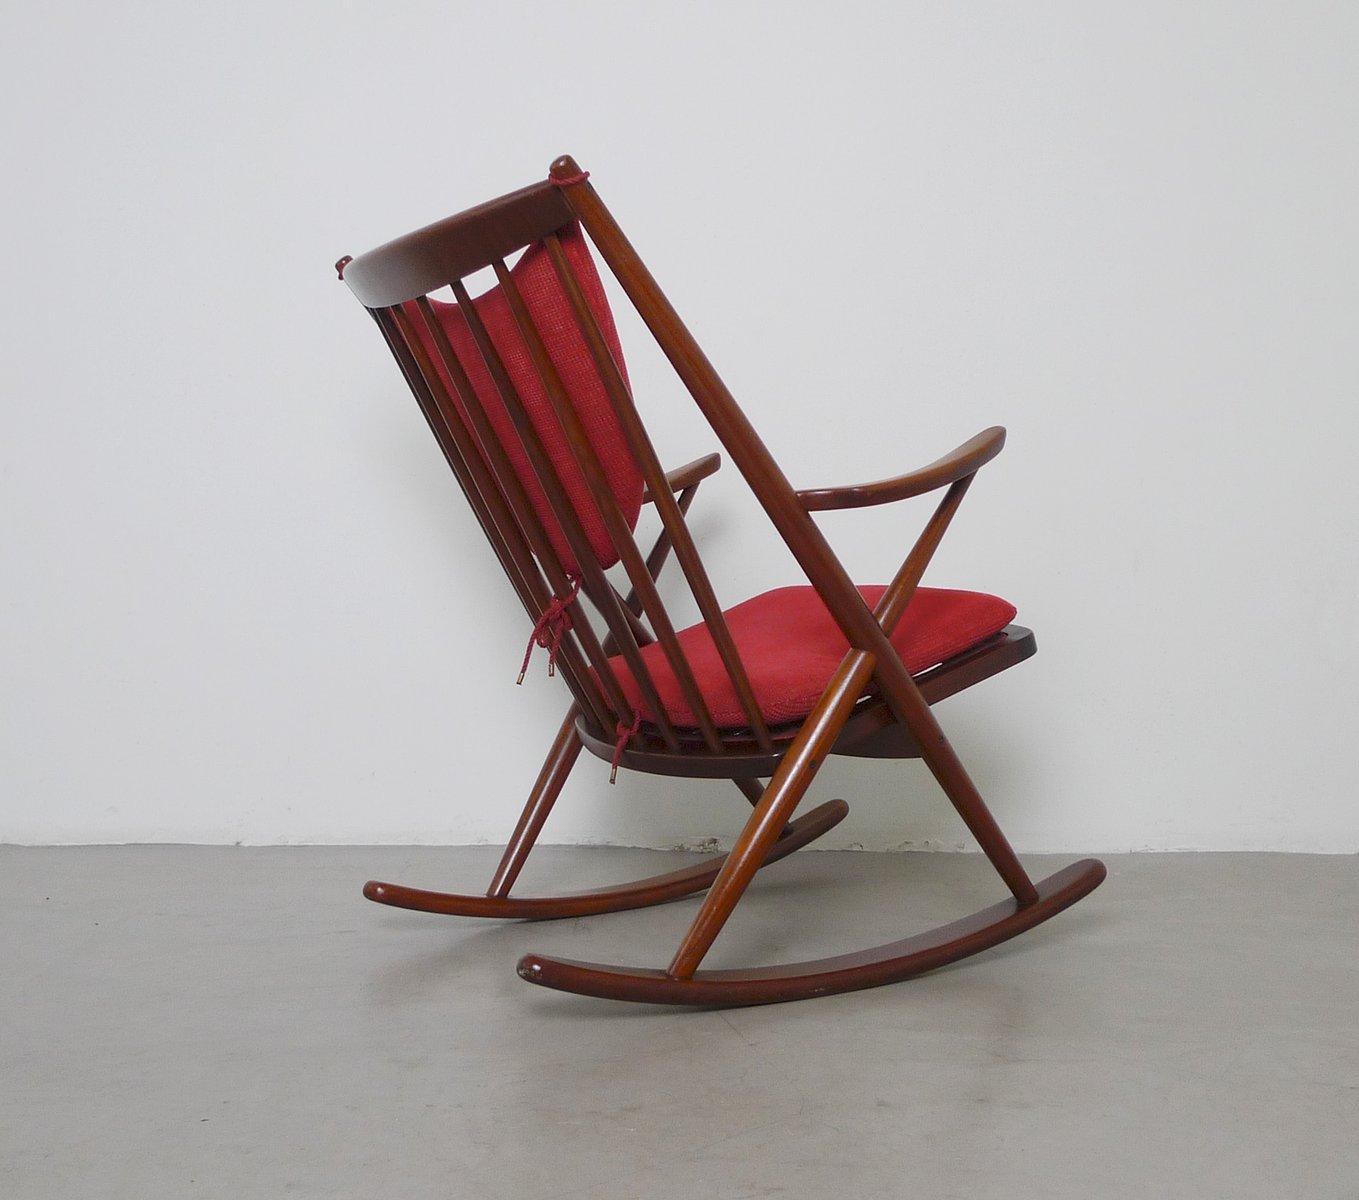 Frank reenskaug rocking chair - Mid Century Teak Rocking Chair By Frank Reenskaug For Bramin